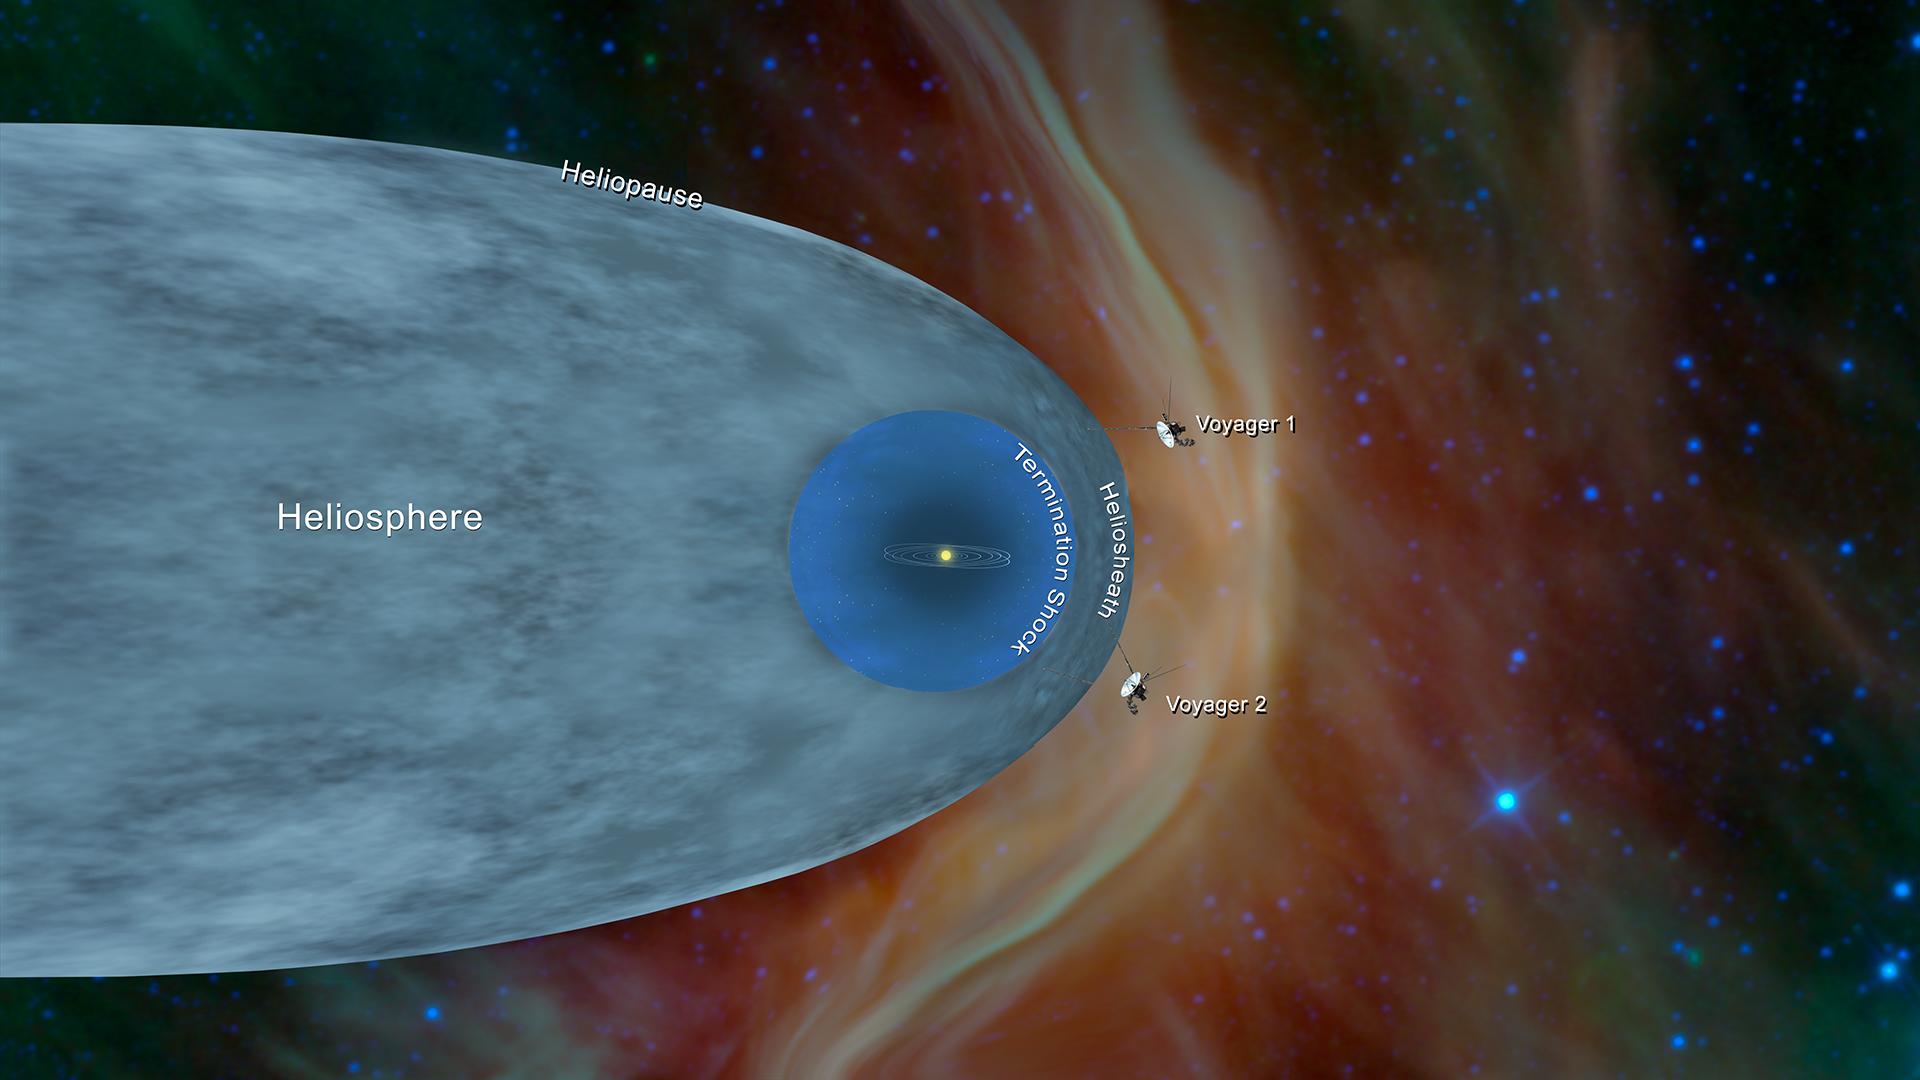 Heliosphere Wikipedia